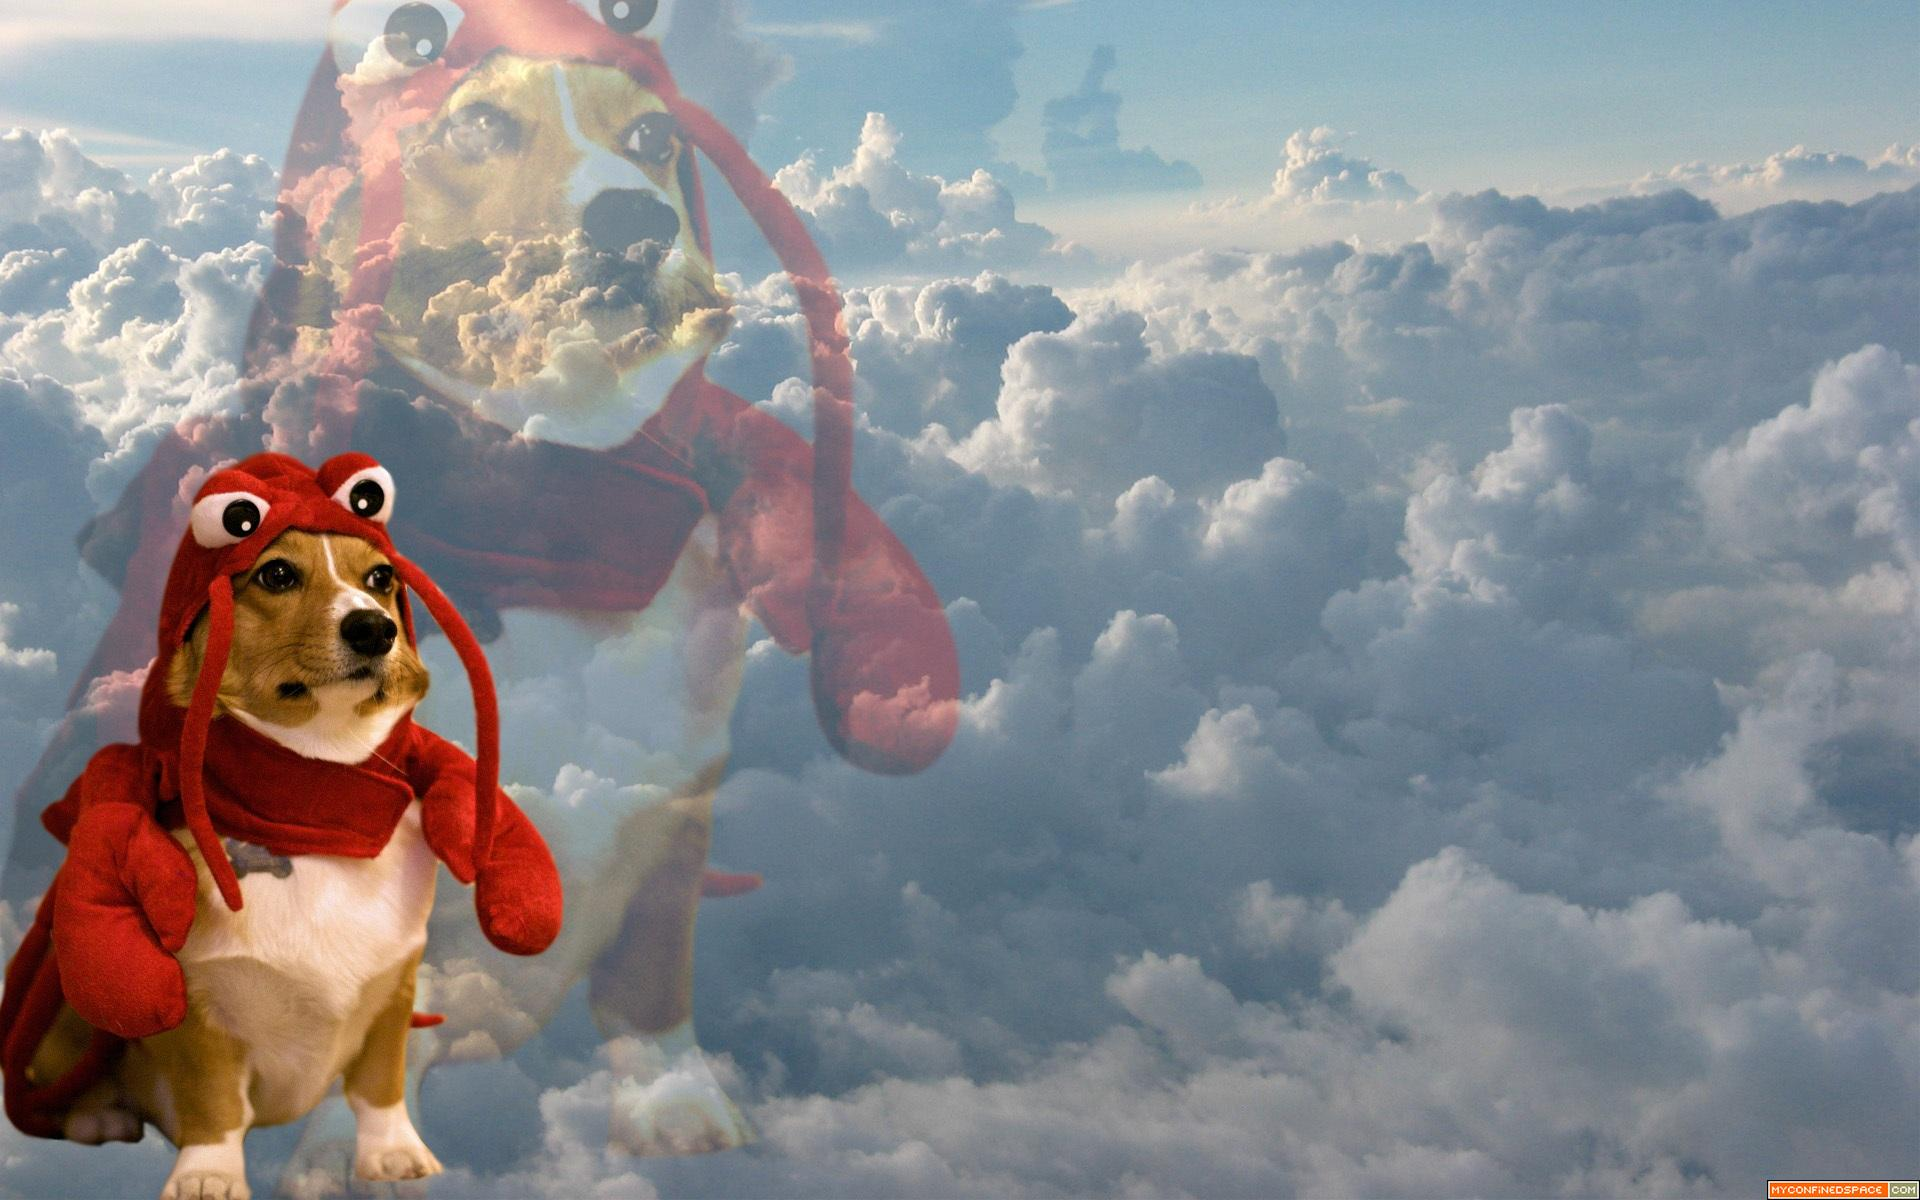 Funny Dog Meme Backgrounds : Lobster dog blank template imgflip